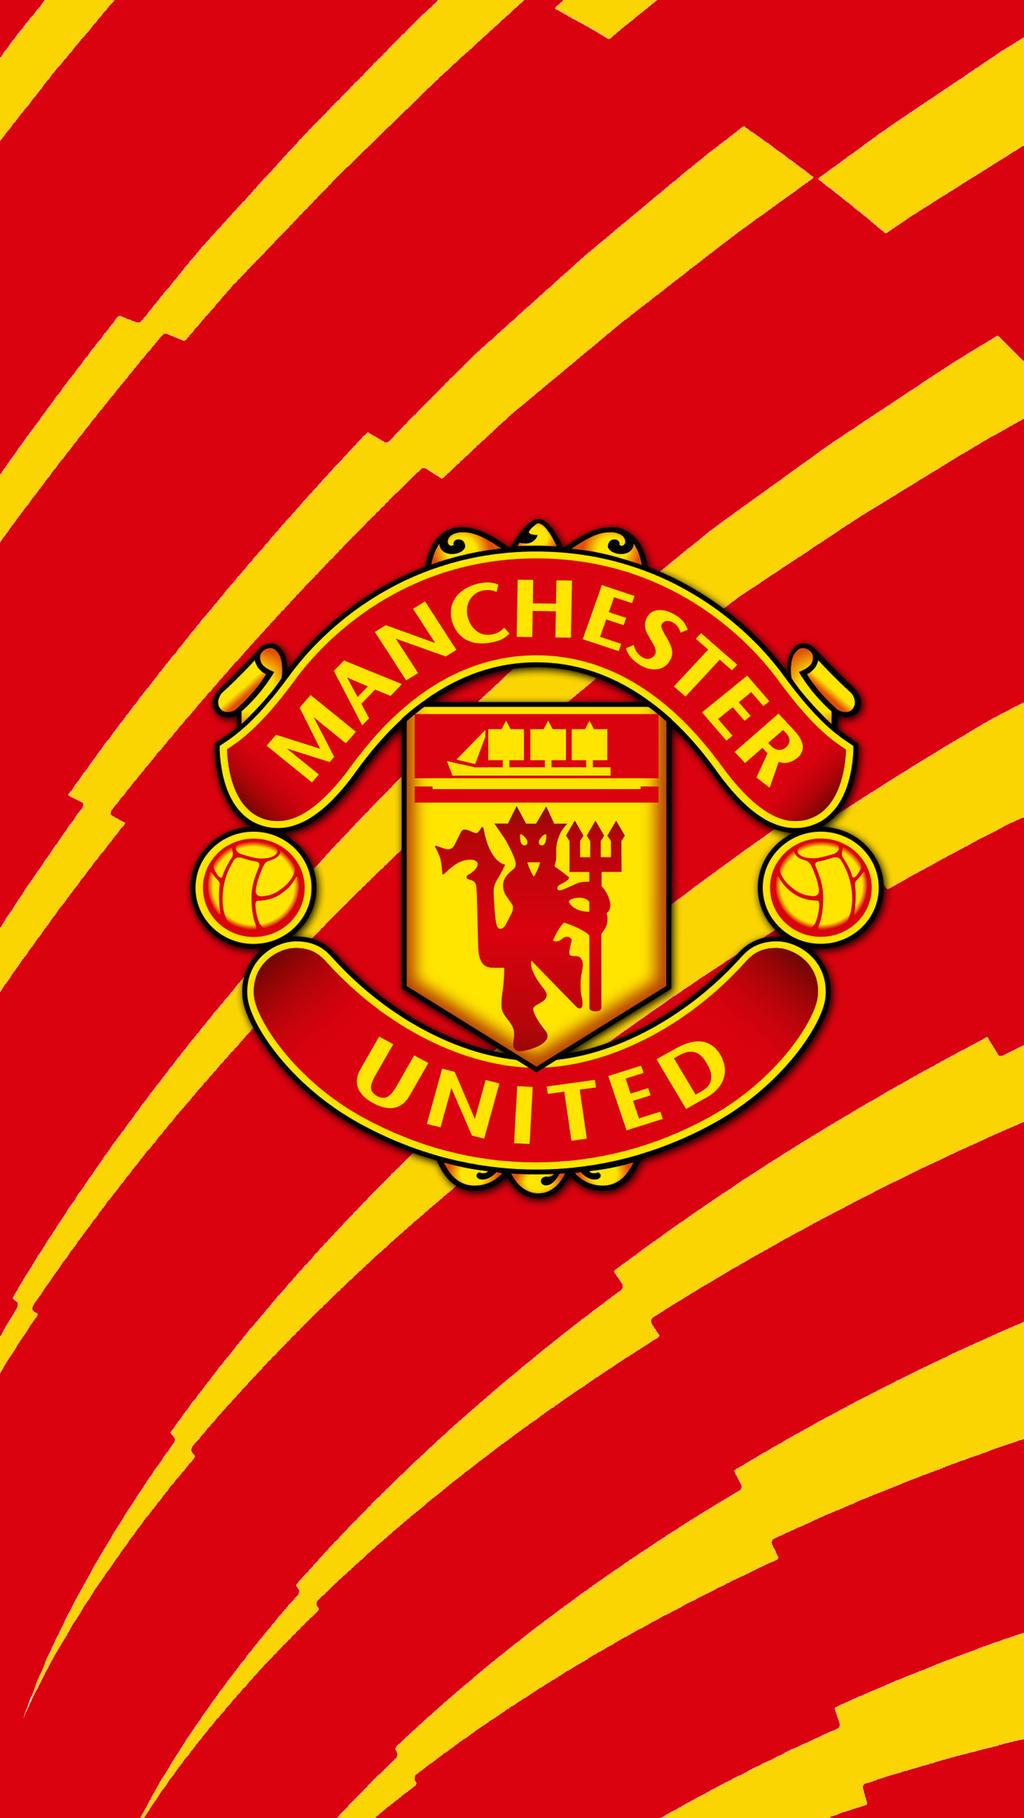 Man United Premier League 16 17 Iphone Wallpaper By Mitchellcook On Deviantart